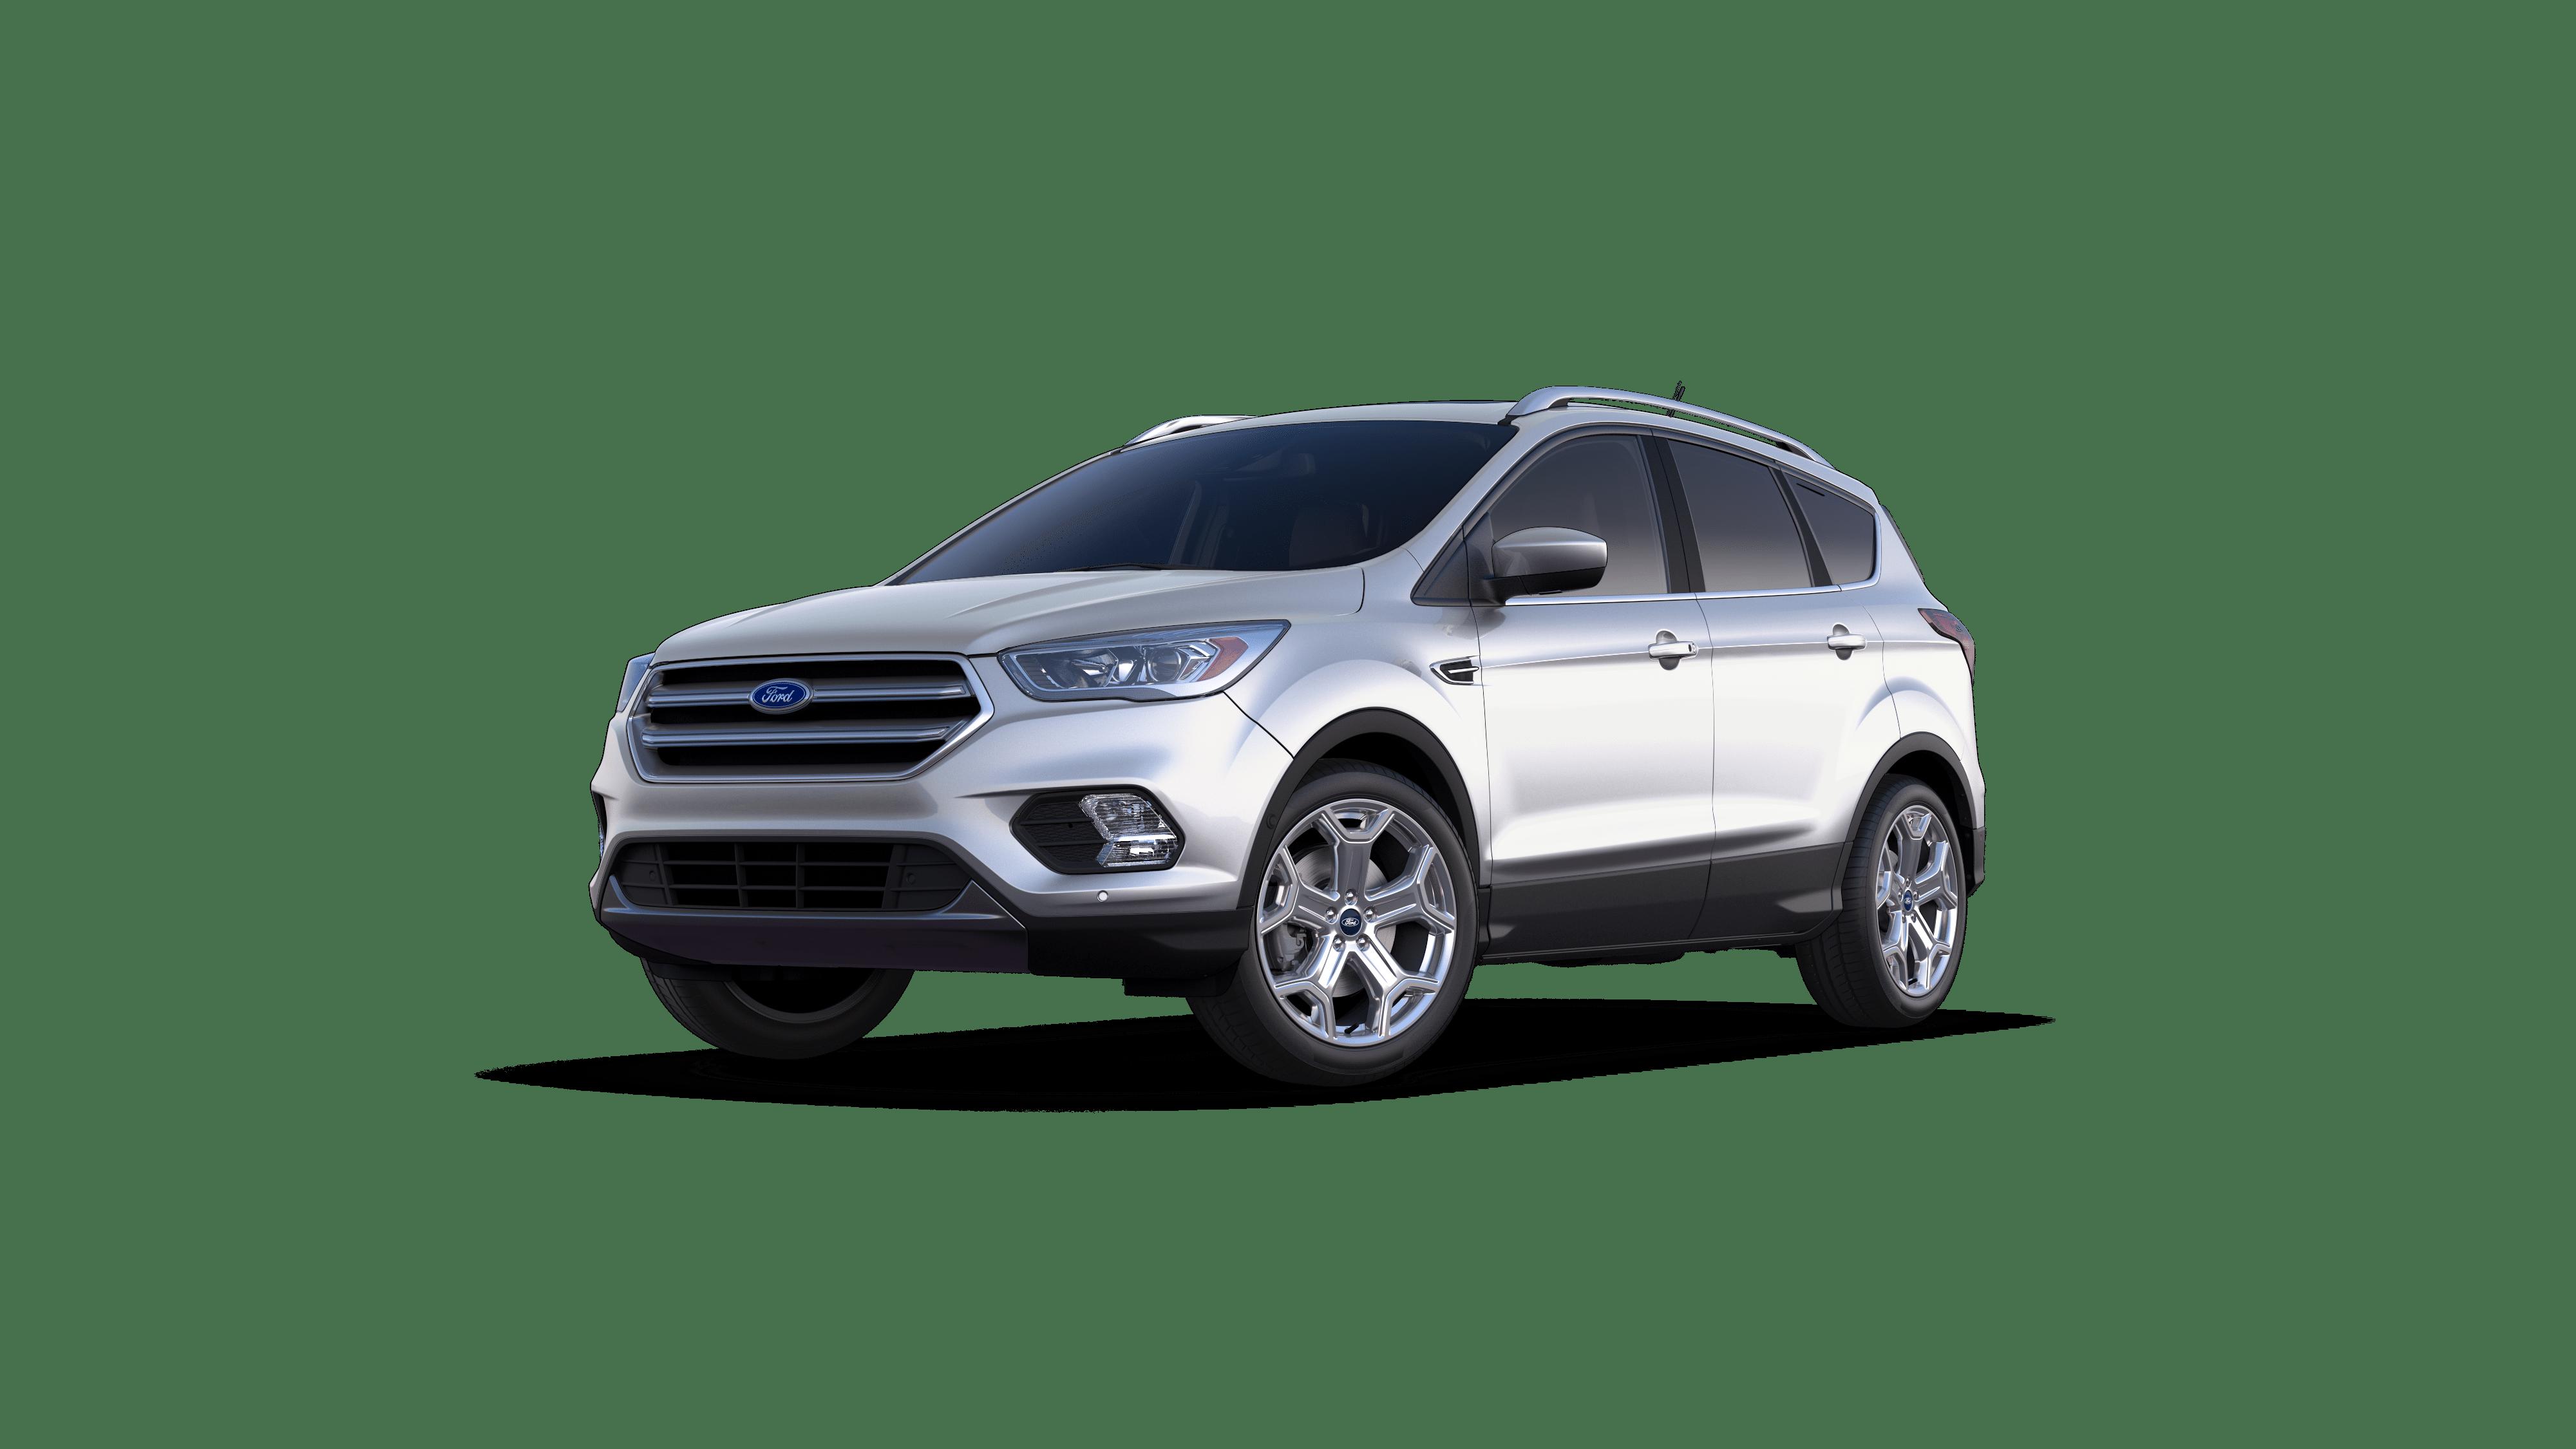 Courtesy Ford Norfolk Ne >> 2019 Ford Escape for sale in Norfolk - 1FMCU9J98KUB79009 ...